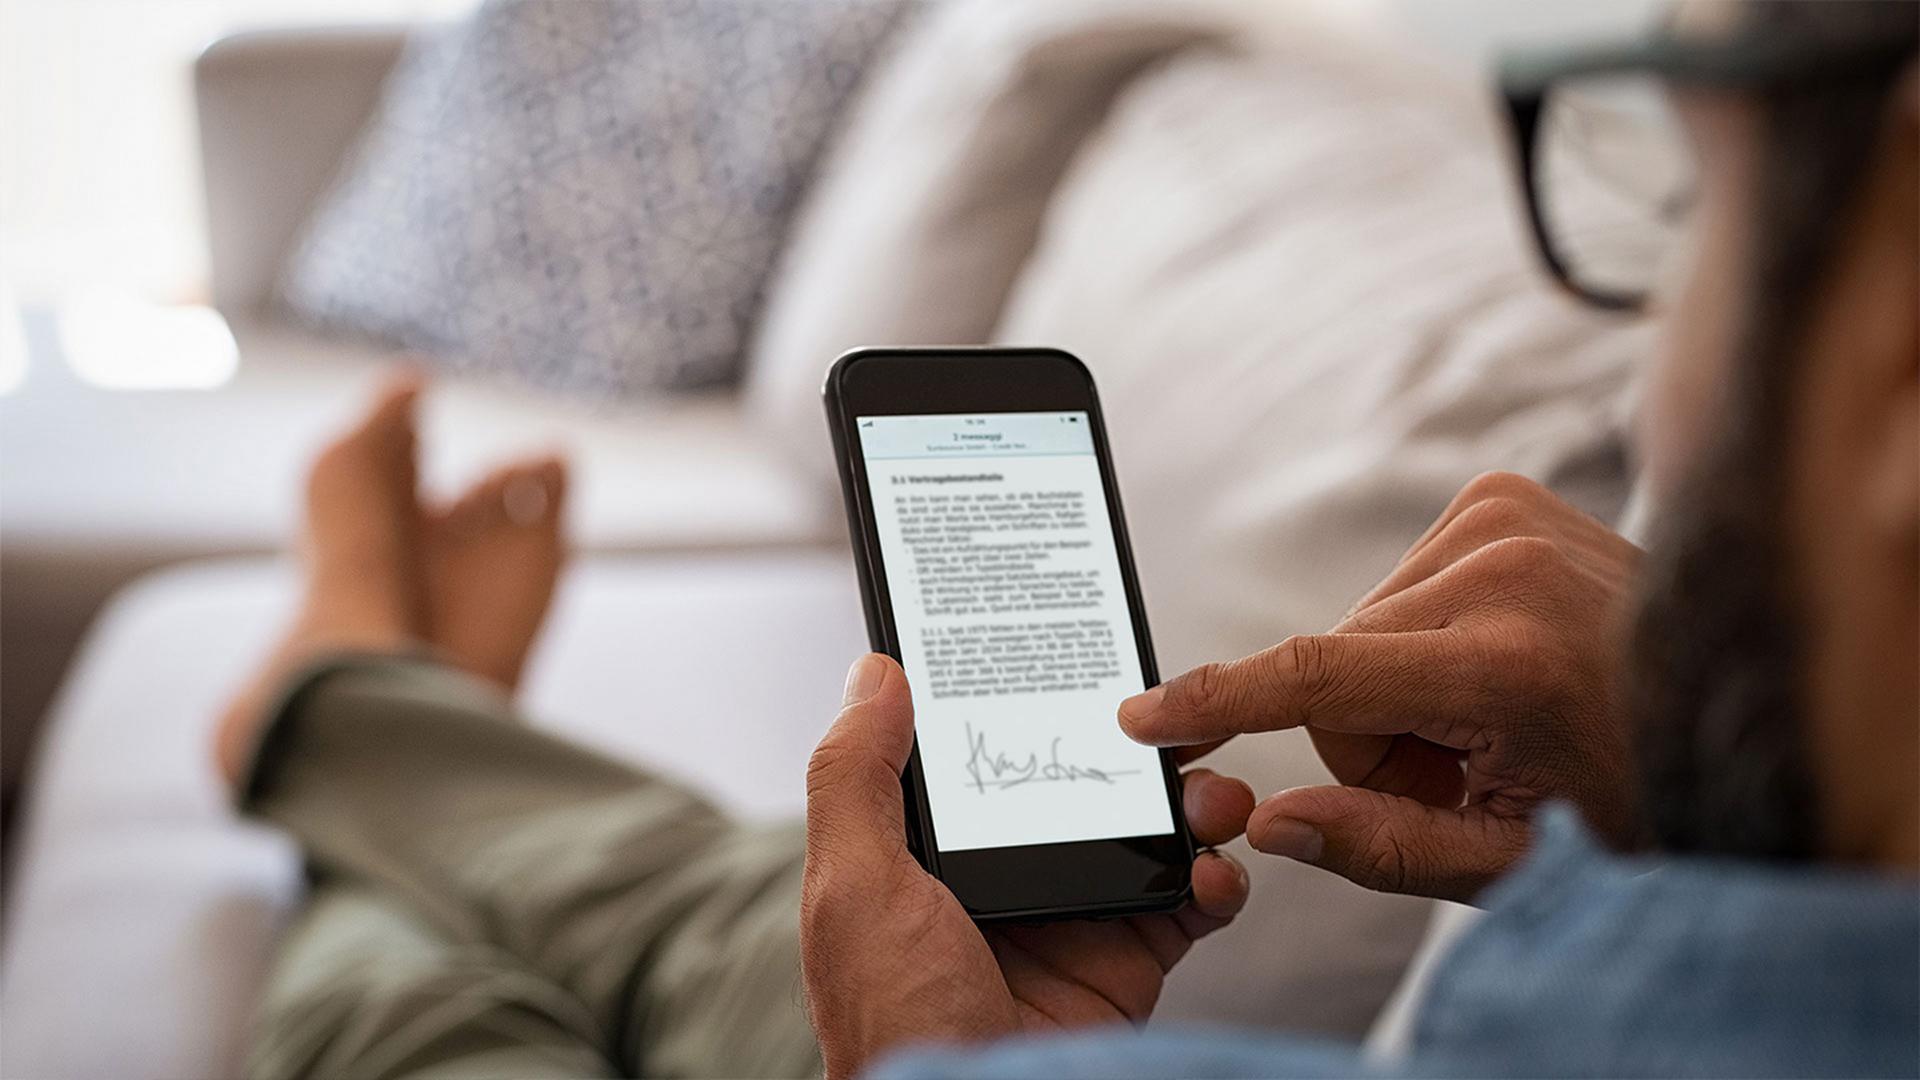 LINK Mobility - websms ermöglicht reibungslose Vertragsunterzeichnung am Smartphone